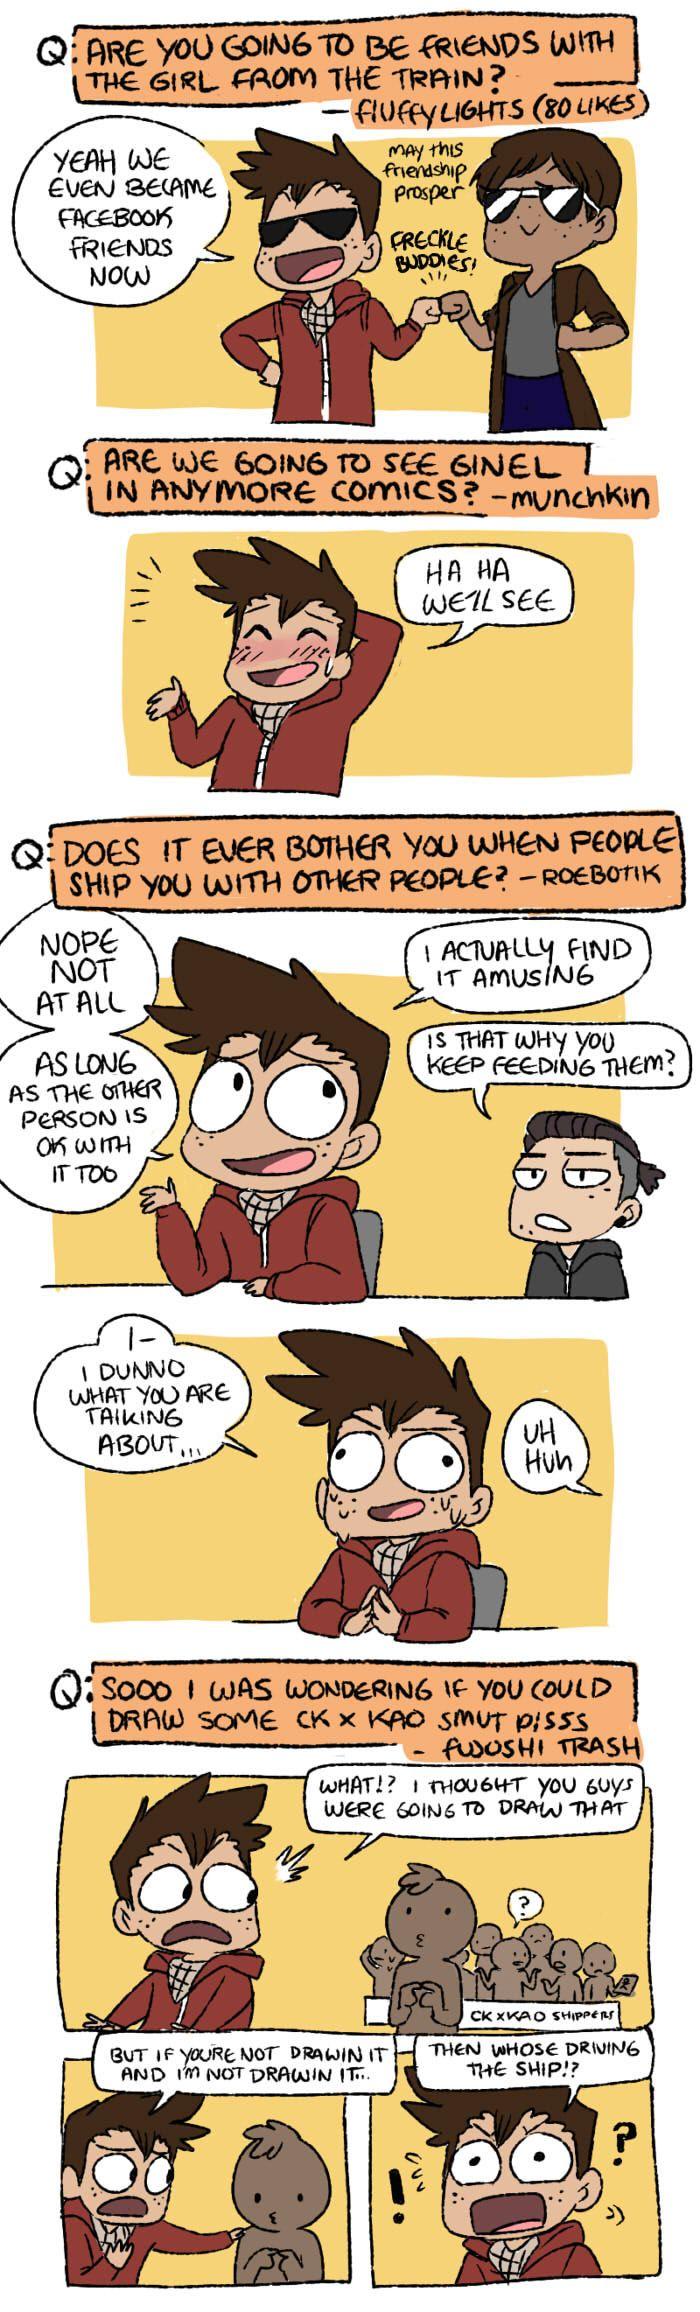 Mondo Mango :: Q&A Part 2: Relation[SHIPS] | Tapastic Comics - image 2